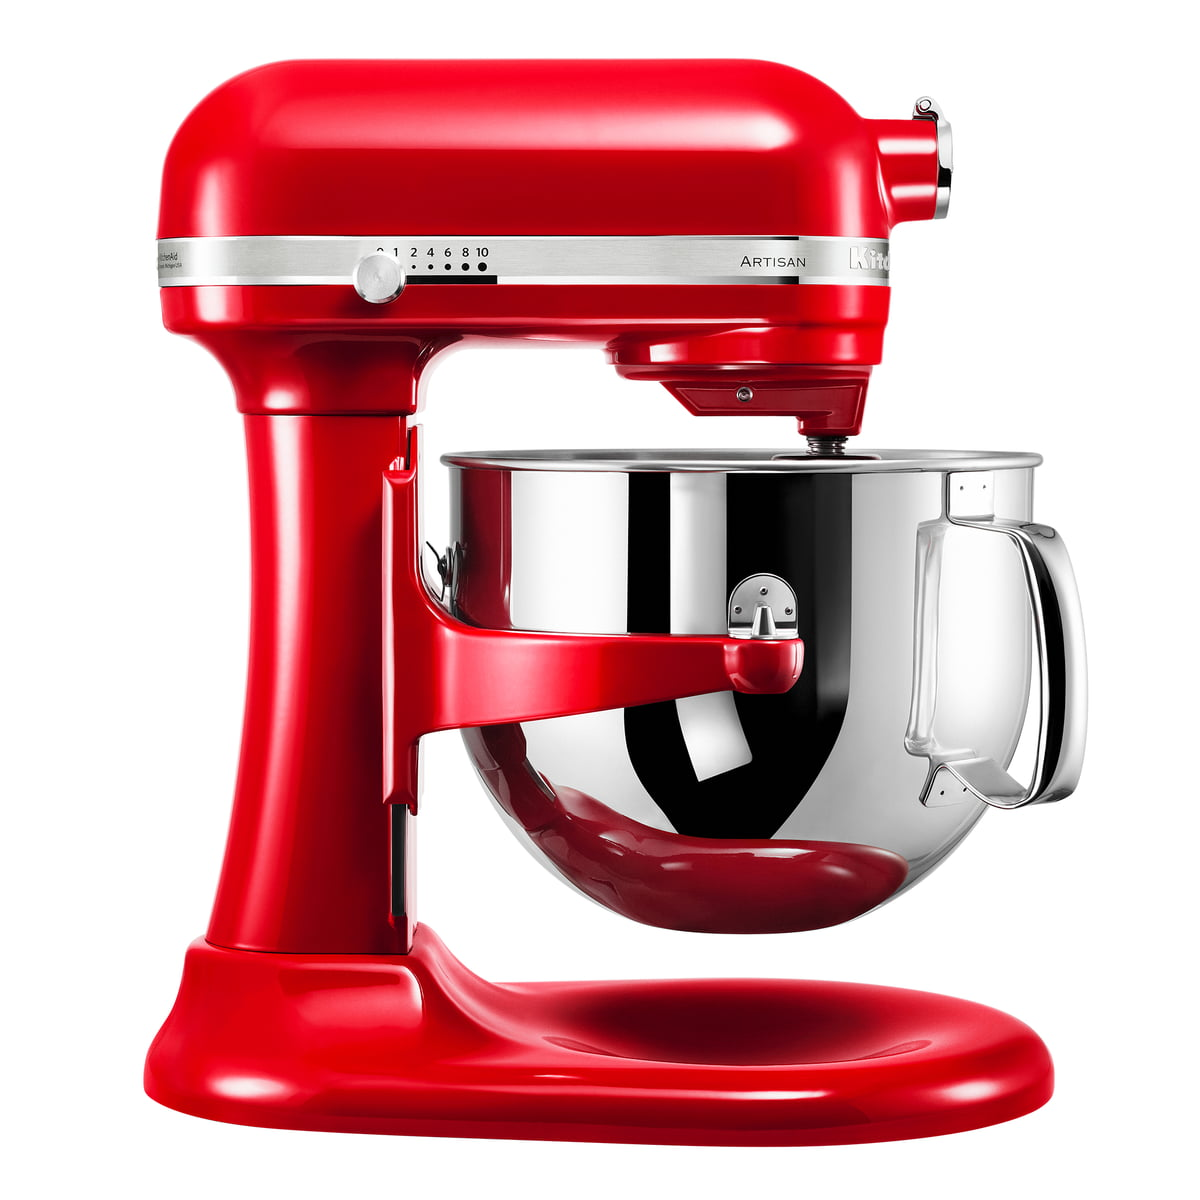 Artisan kitchen appliance 6,9 l by KitchenAid on kitchenaid mixer, kitchenaid artisan stand mixer, kitchenaid artisan mixer, kitchenaid stand mixer,